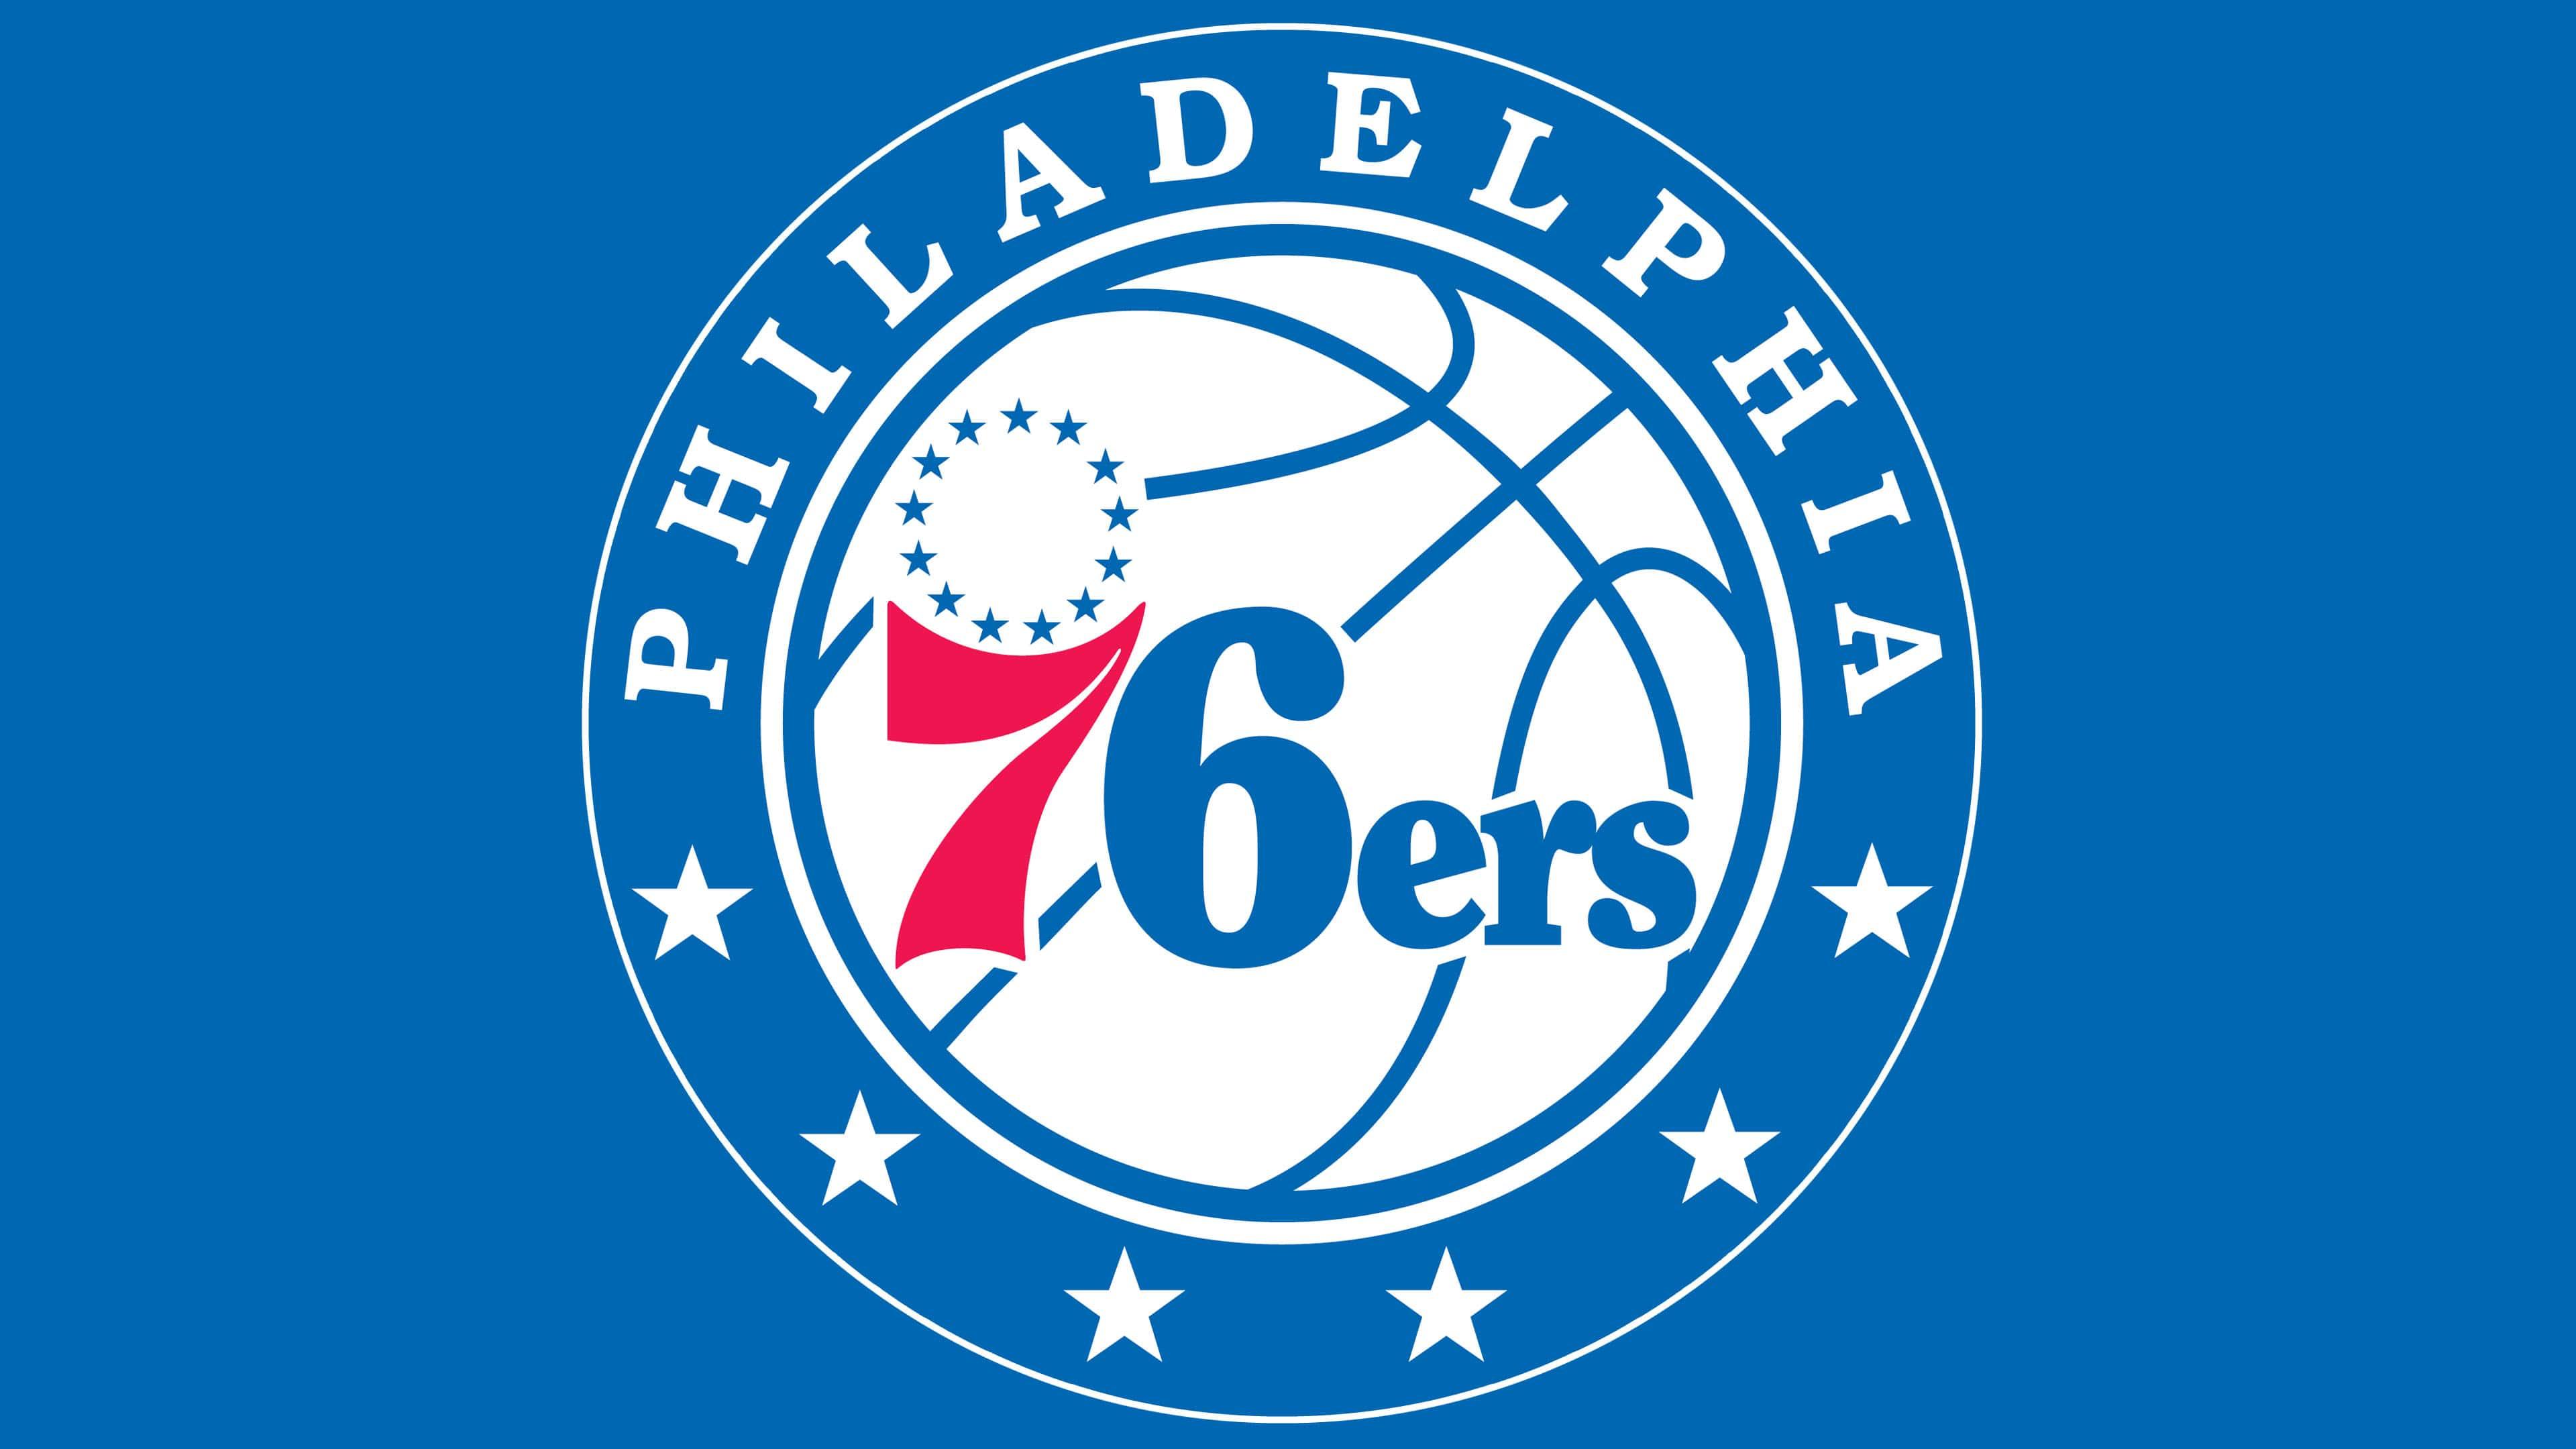 Philadelphia 76ers logos.